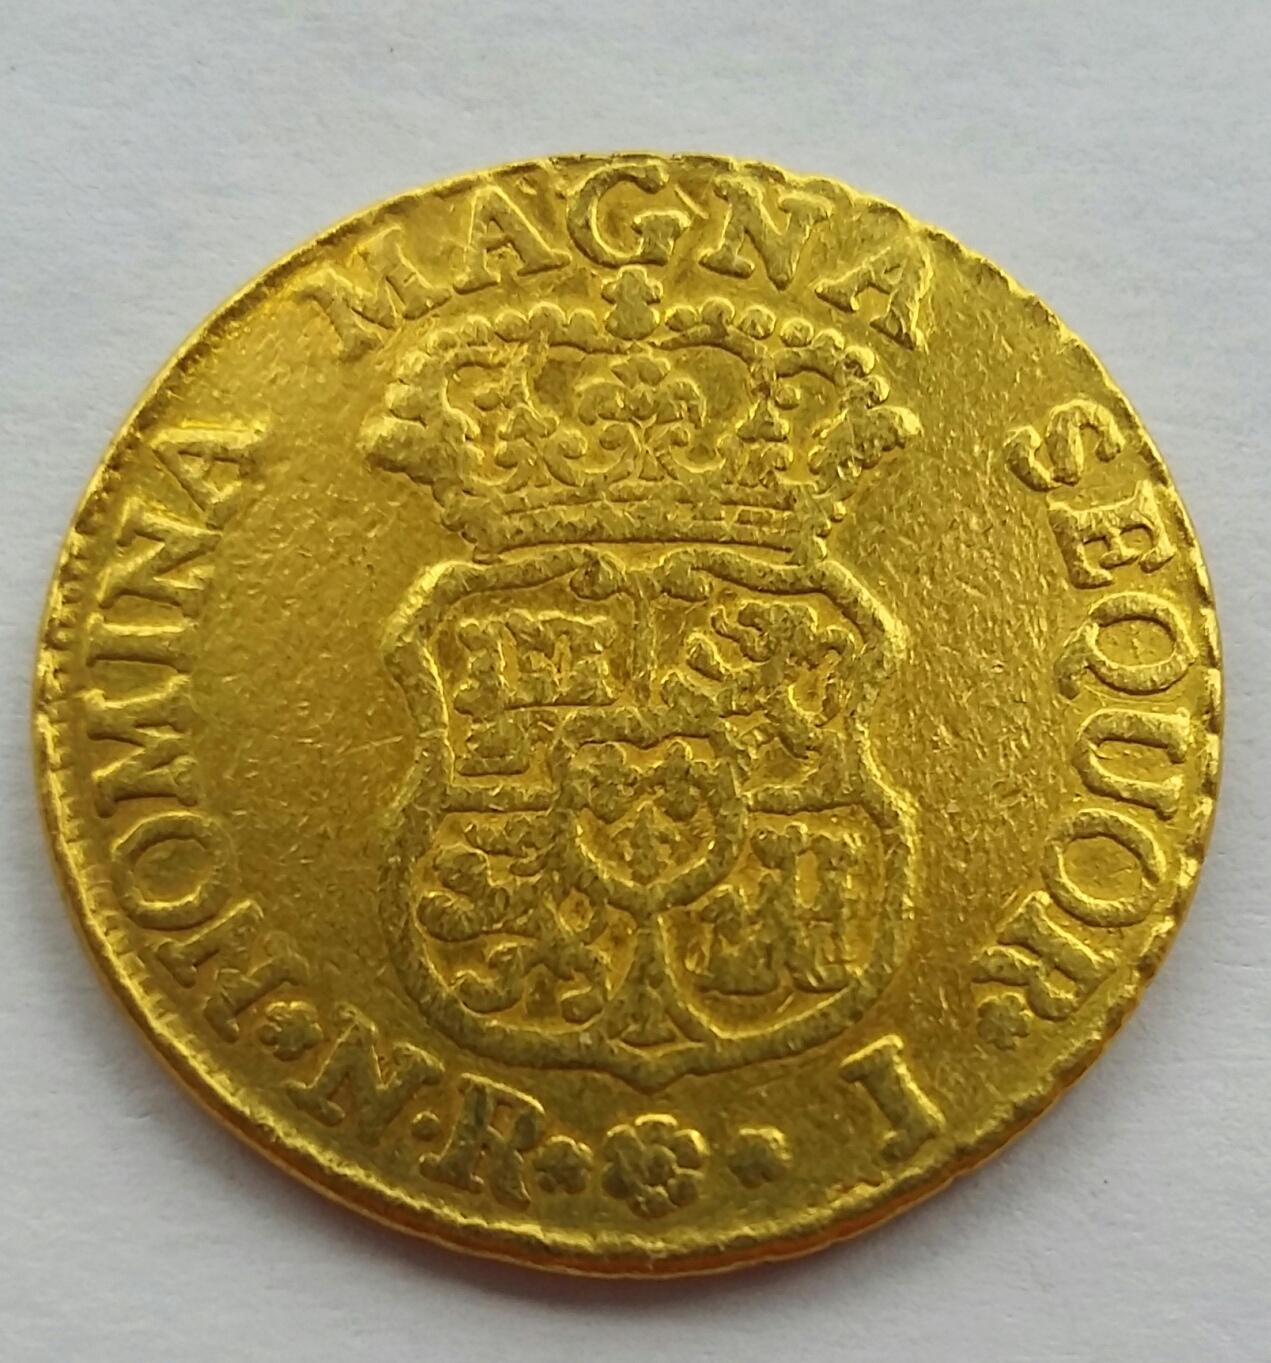 2 Escudos 1759 Santa Fe de Nuevo Reino J - Fernando VI 20191211